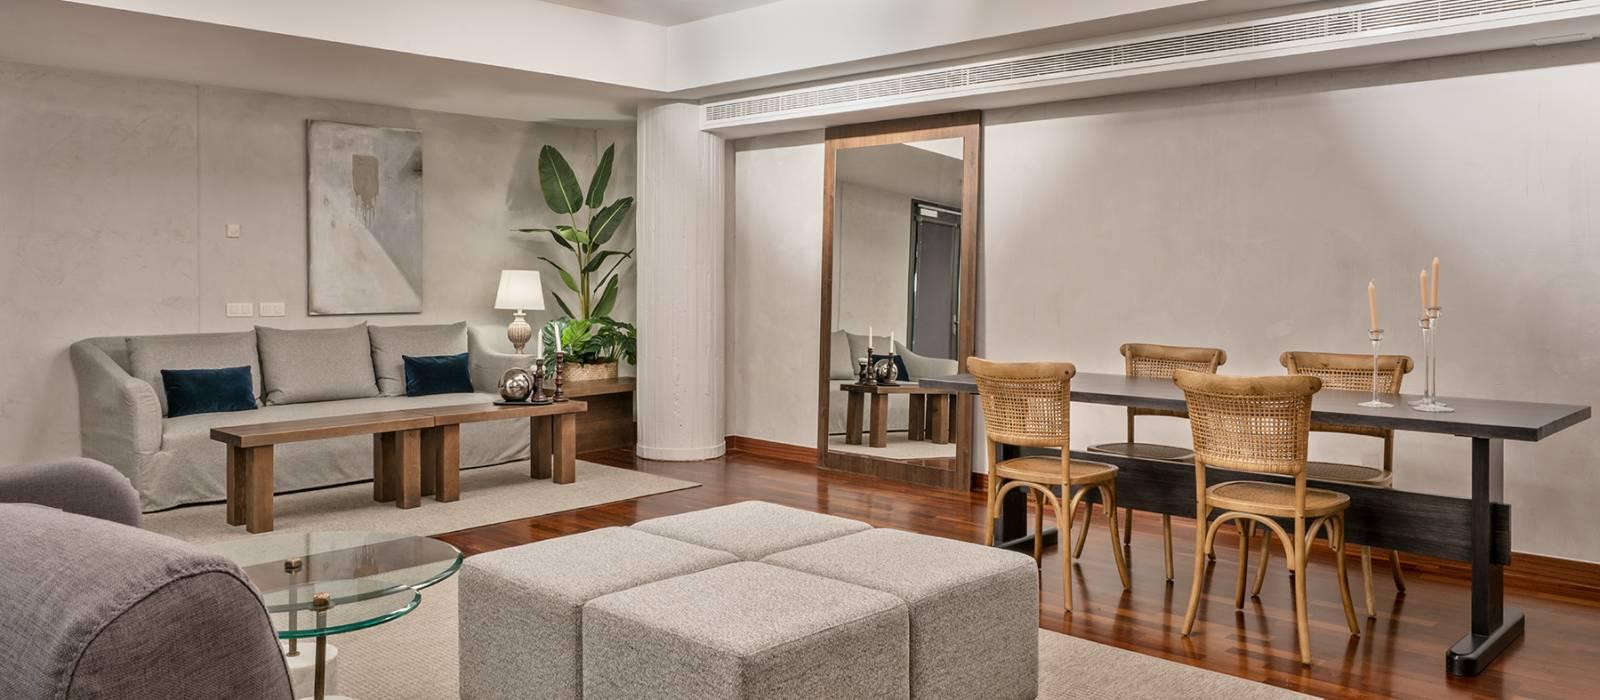 Servizi Soma Hotel Madrid - Vincci Hotels - Biblioteca